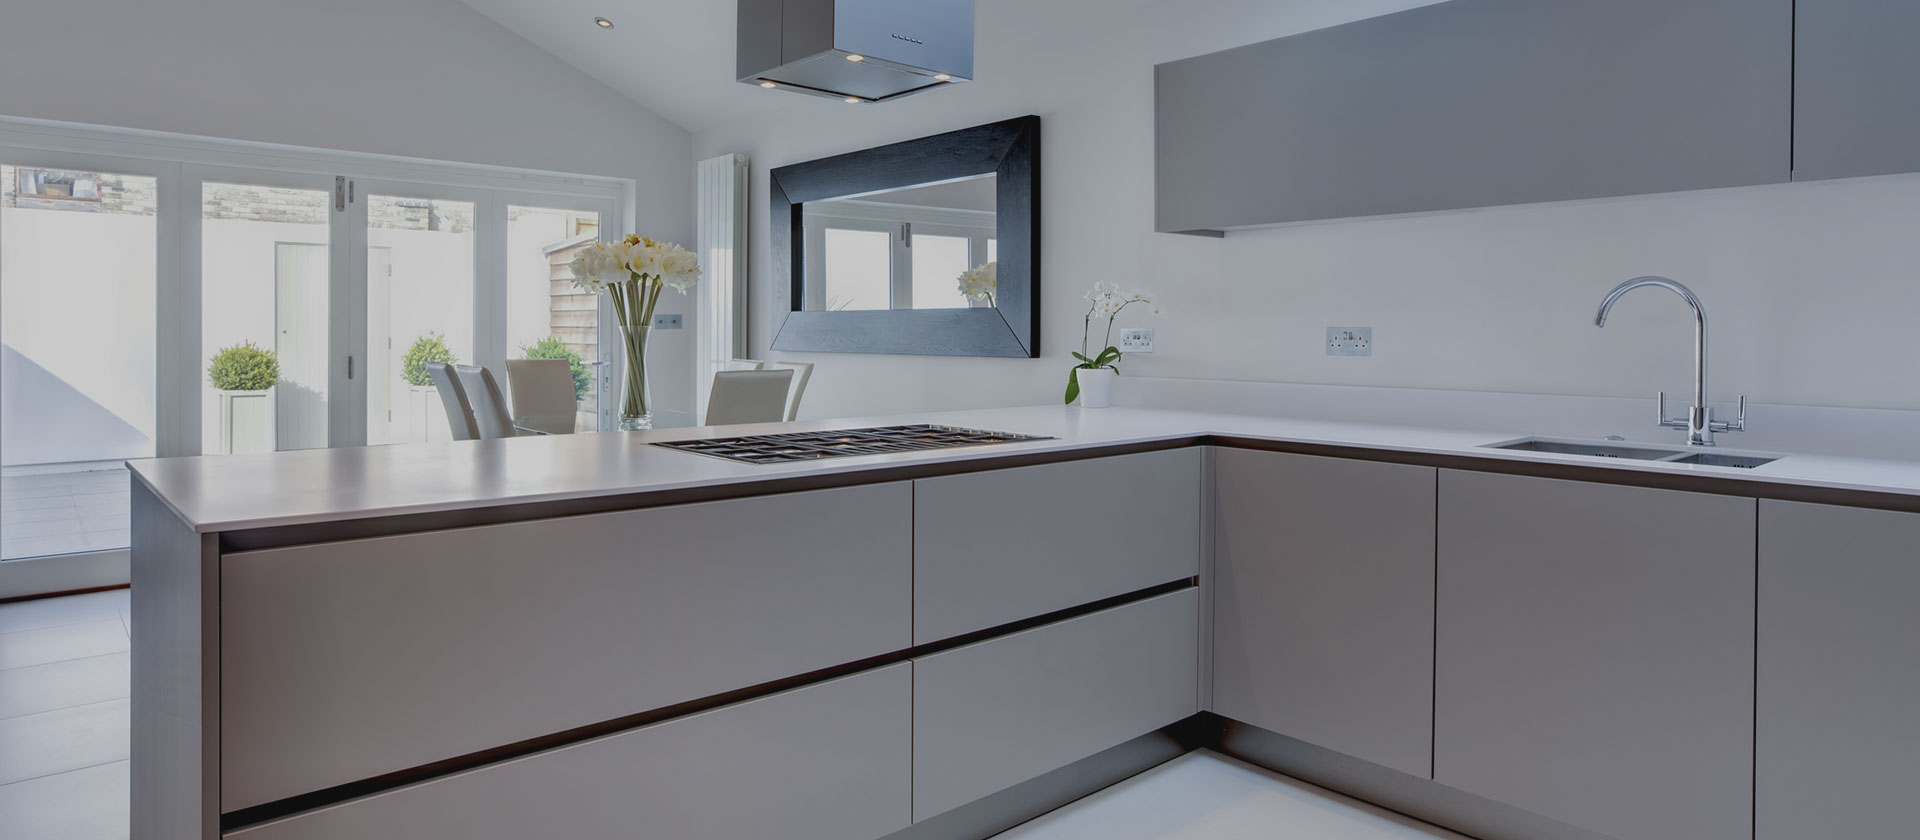 shaker cabinet painted contemporary linen microwave door rockford mid cliqstudios cabinets undercounter